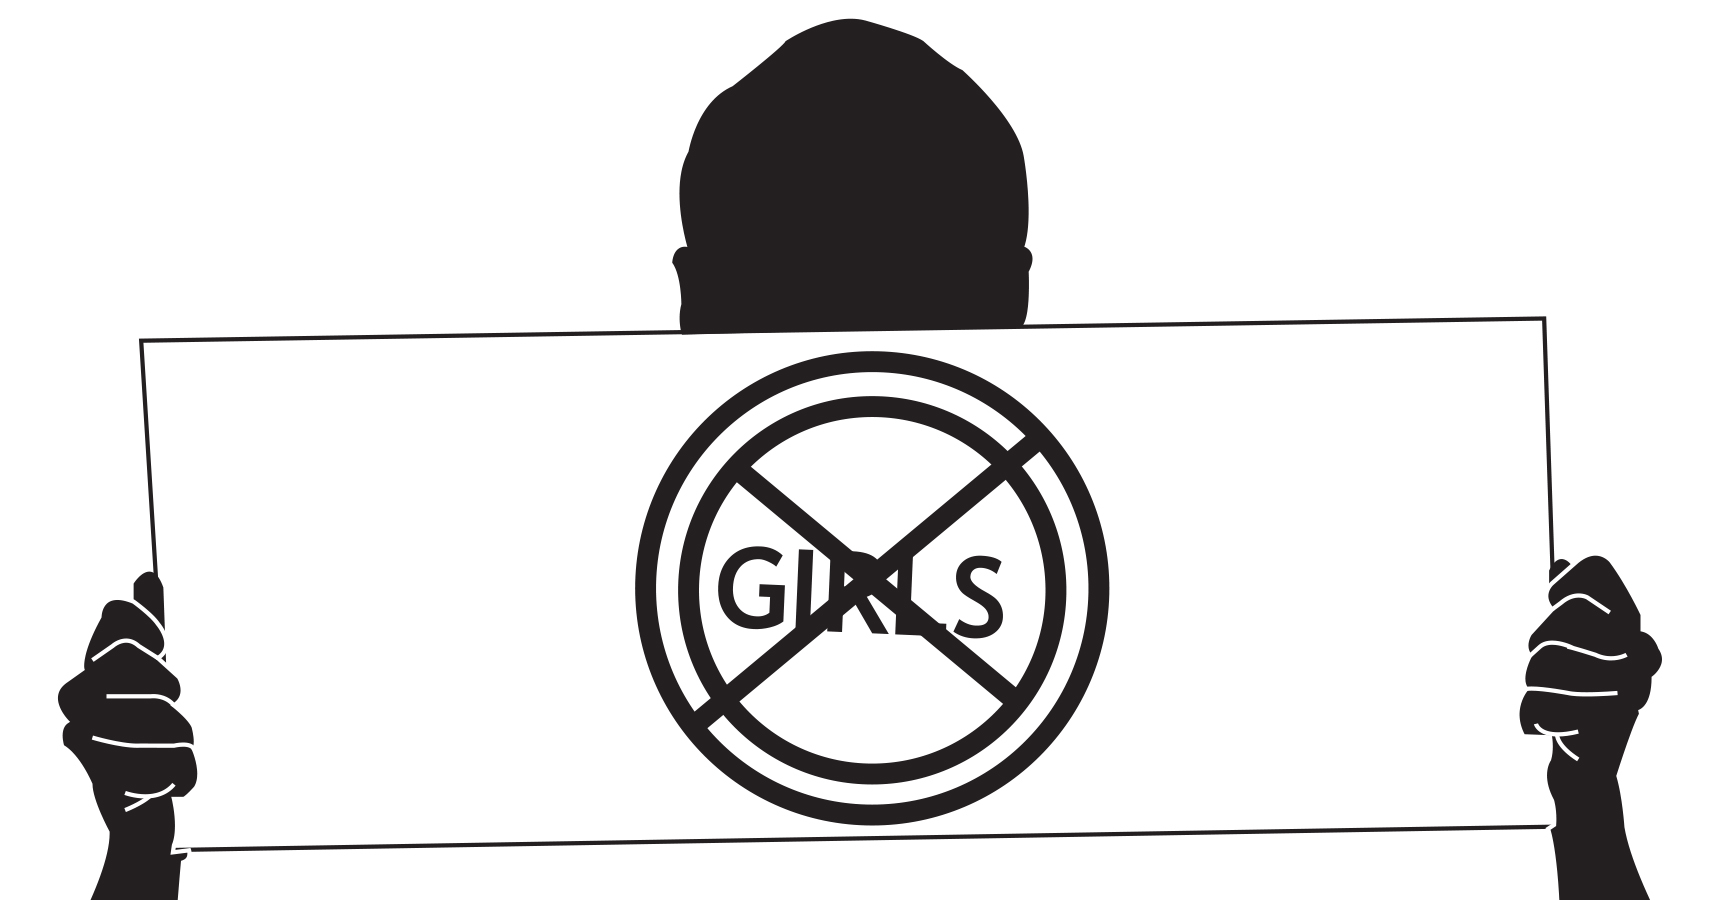 Editorial: End Loyola's Mardi Gras gender rule